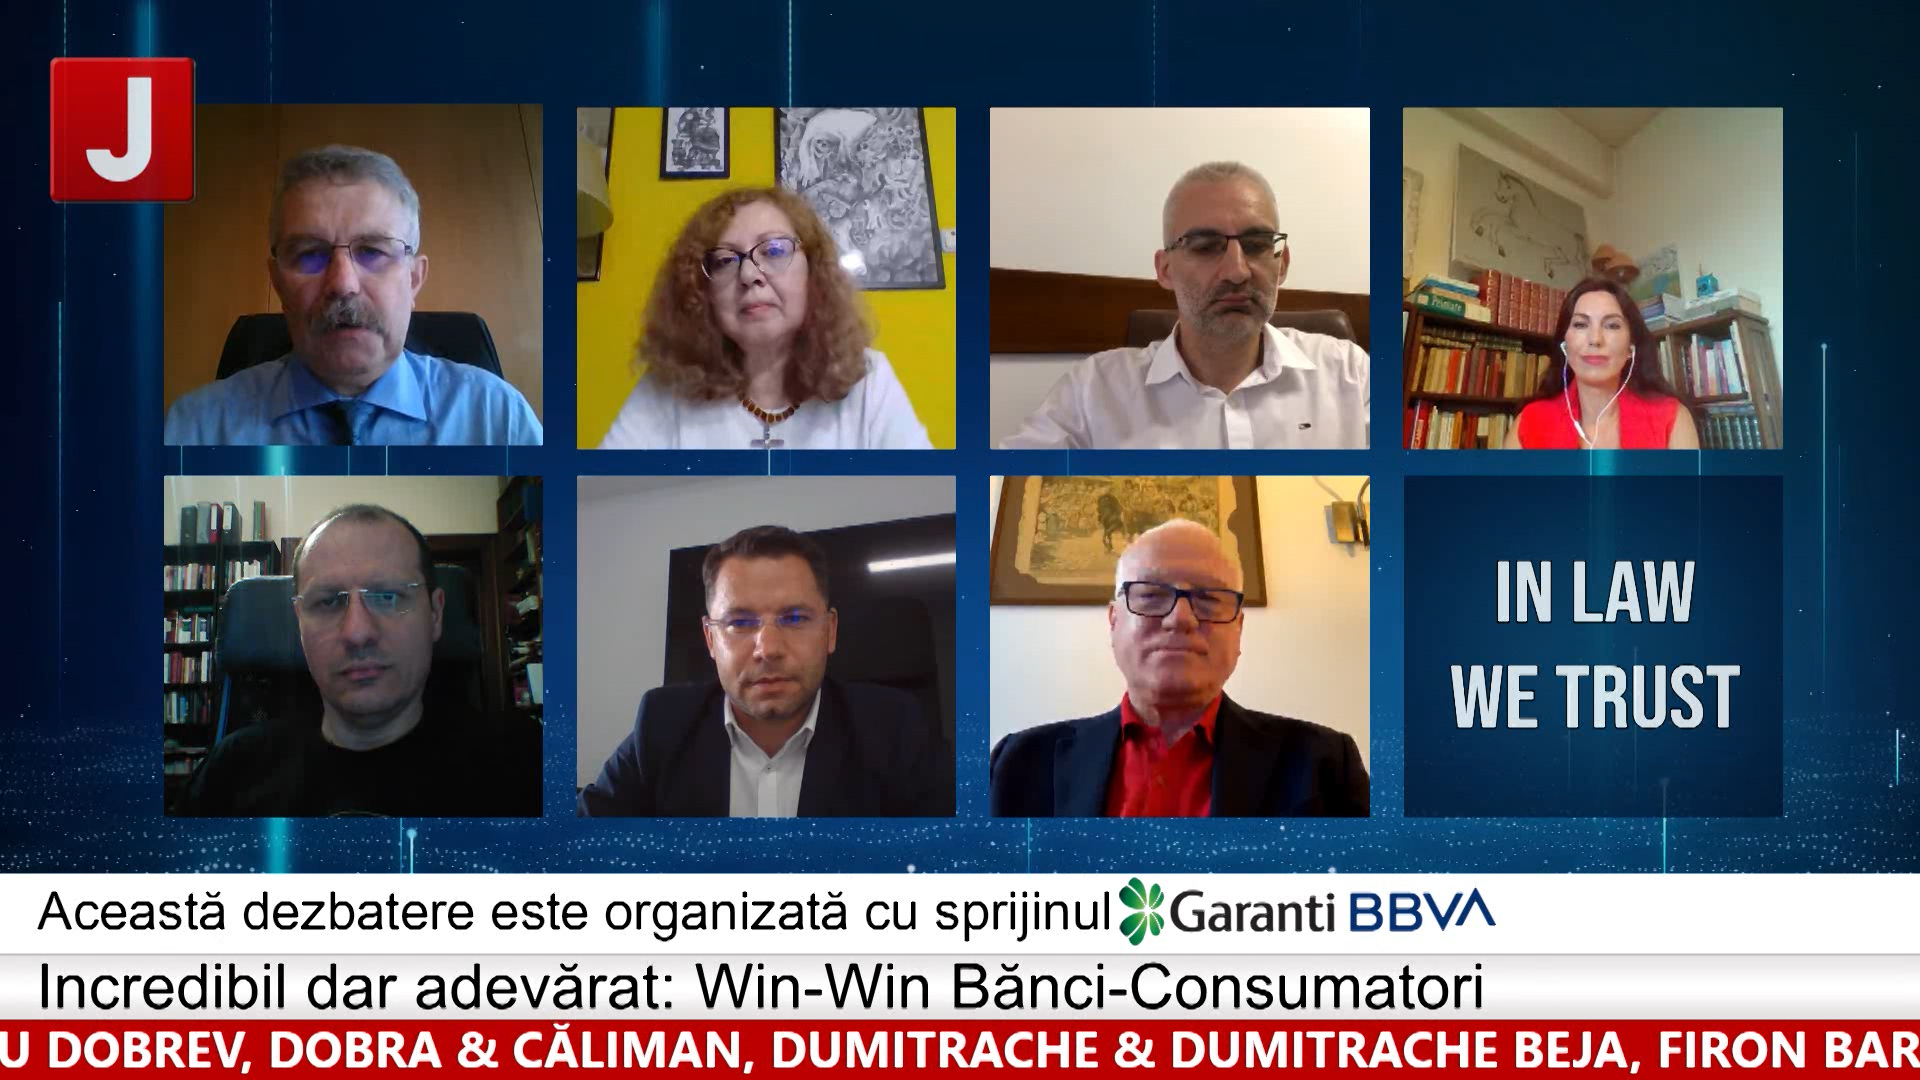 Incredibil dar adevărat: Win-Win Bănci-Consumatori